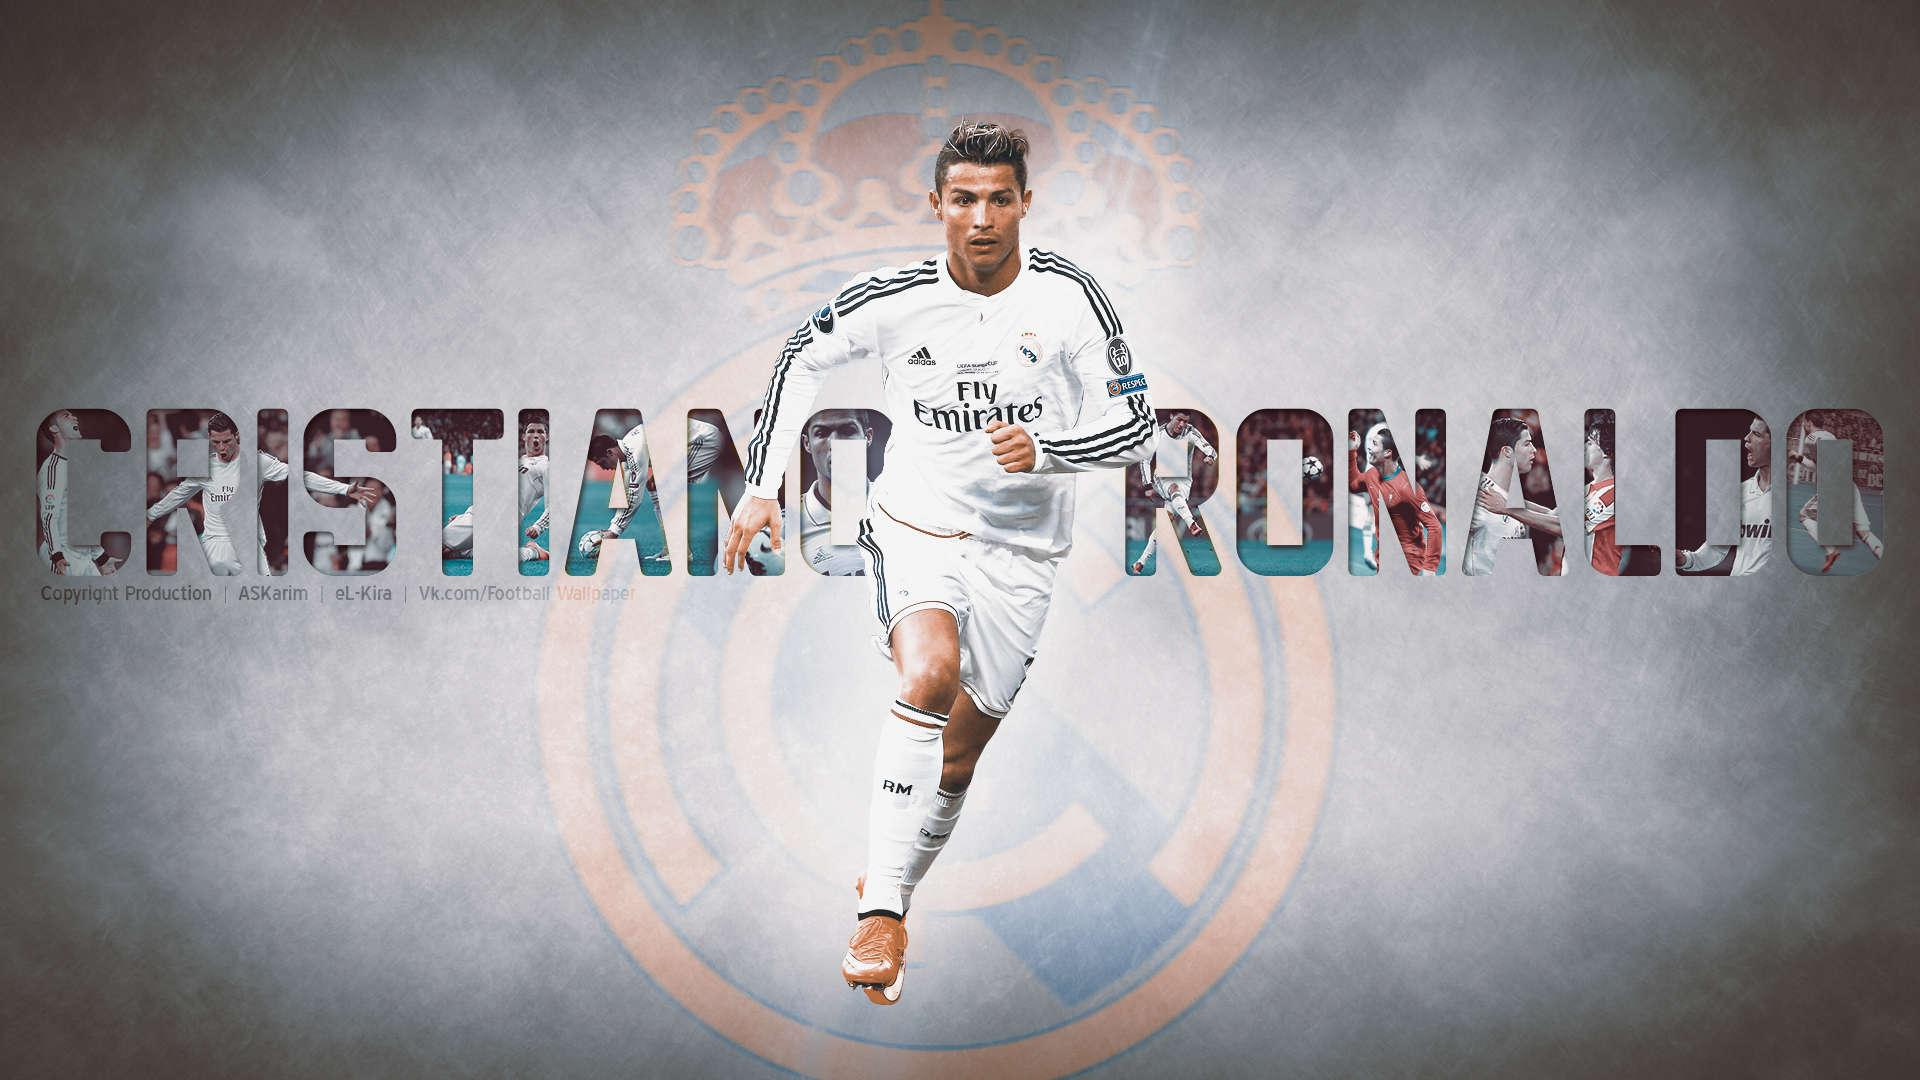 Hd wallpaper ronaldo - Cristiano Ronaldo Wallpapers 2016 Real Madrid Wallpaper Cave